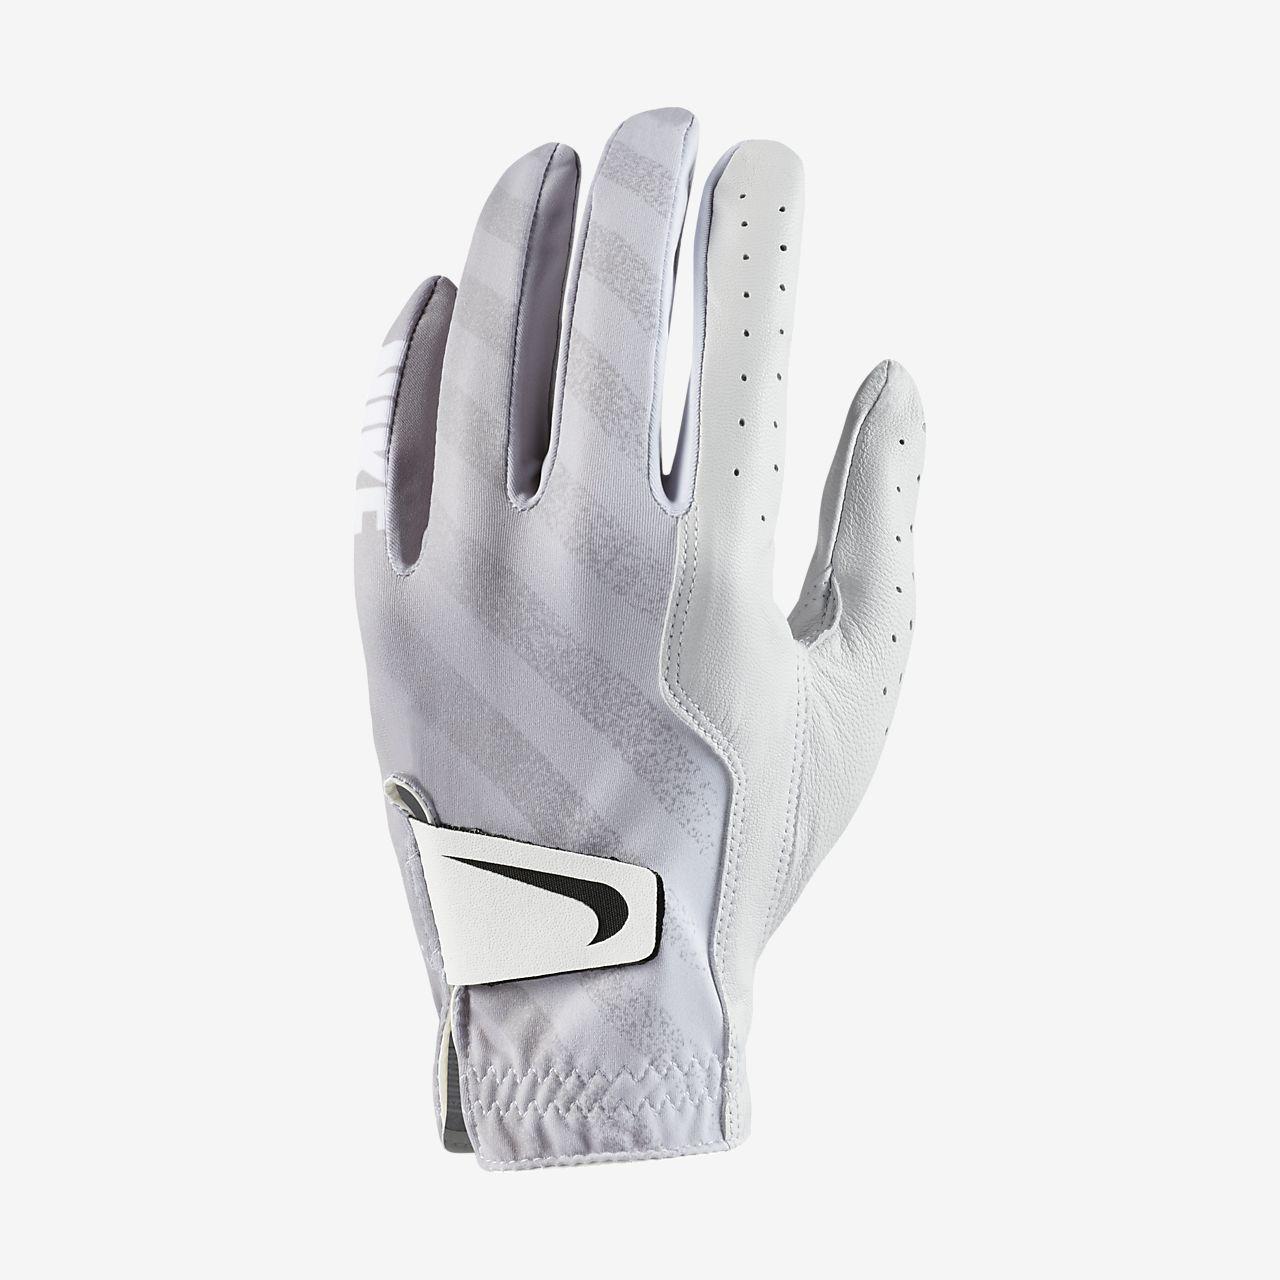 Guanto da golf Nike Tech - Donna (Mano sinistra/Regular fit)